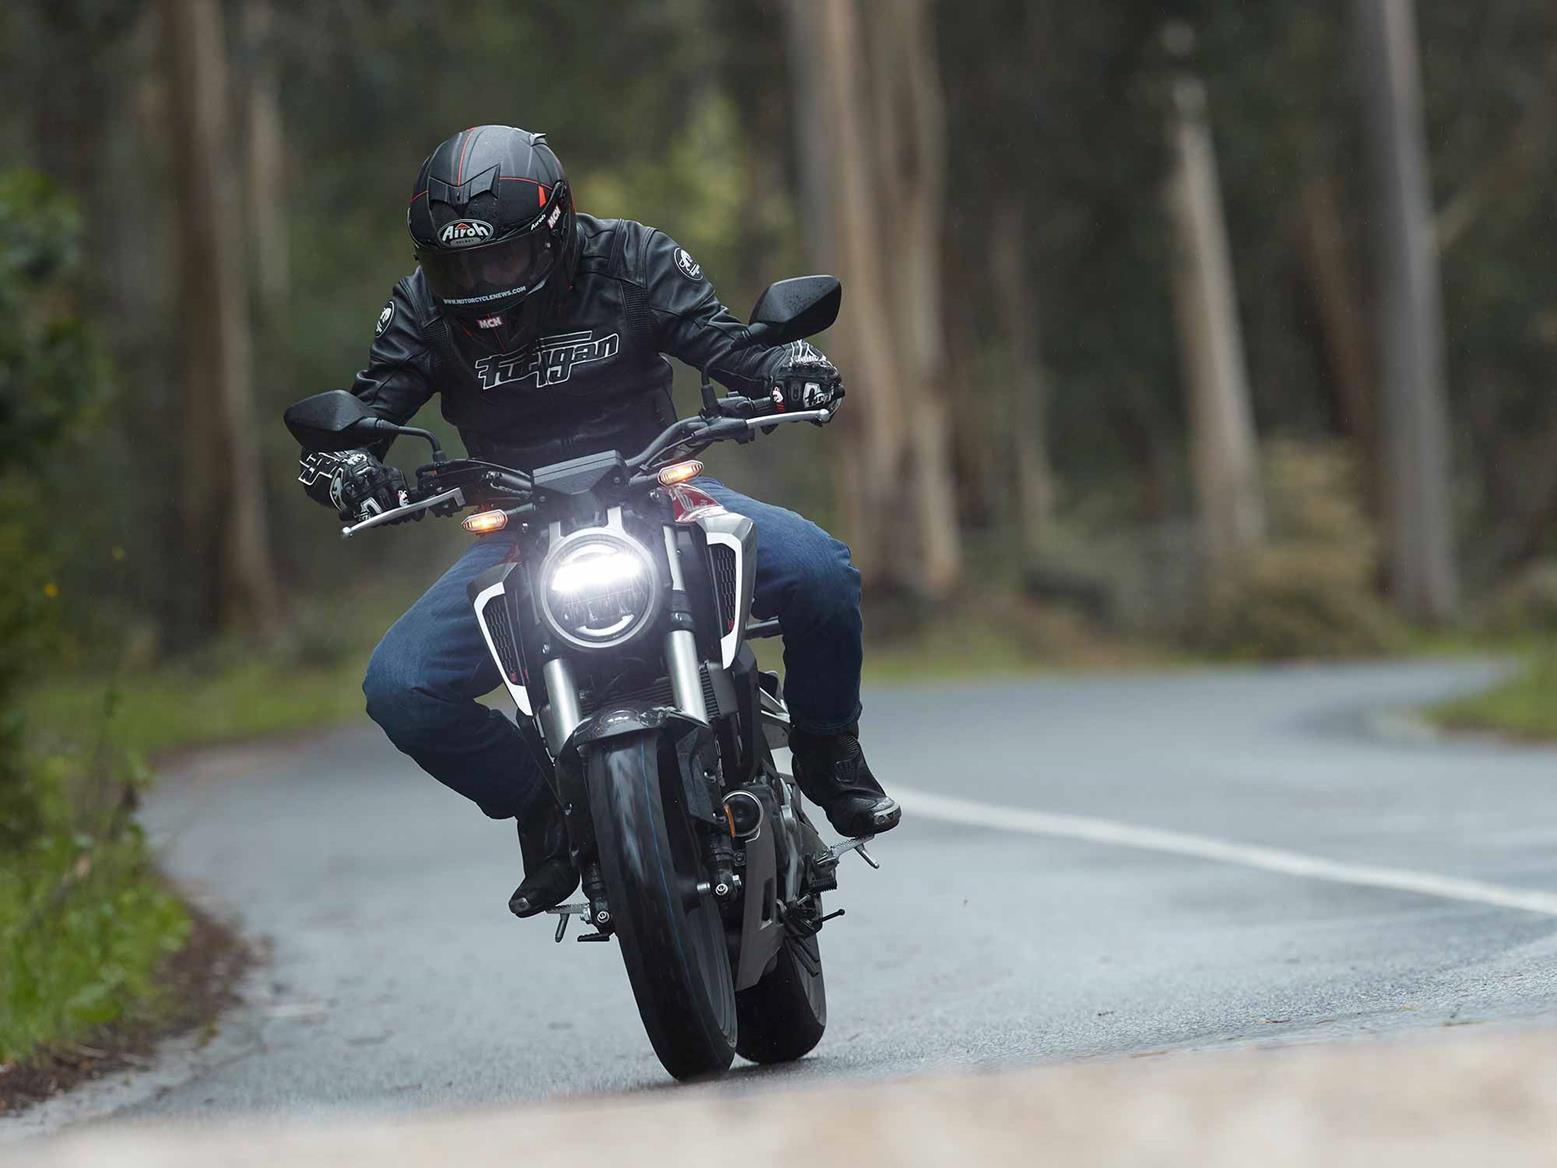 Cornering on the Honda CB125R